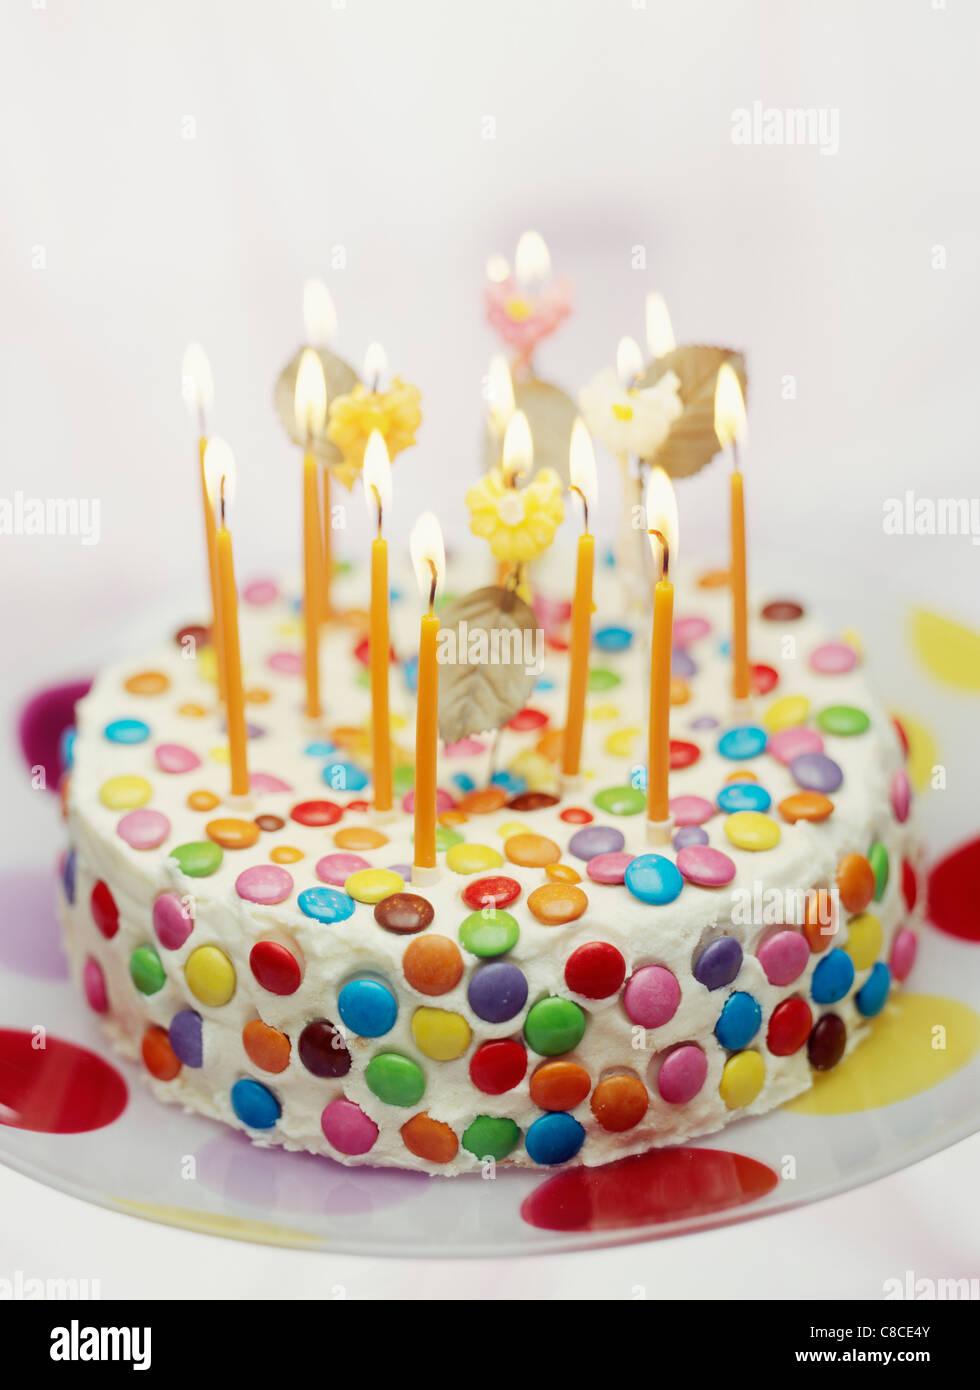 Tarta de Cumpleaños multicolor Imagen De Stock